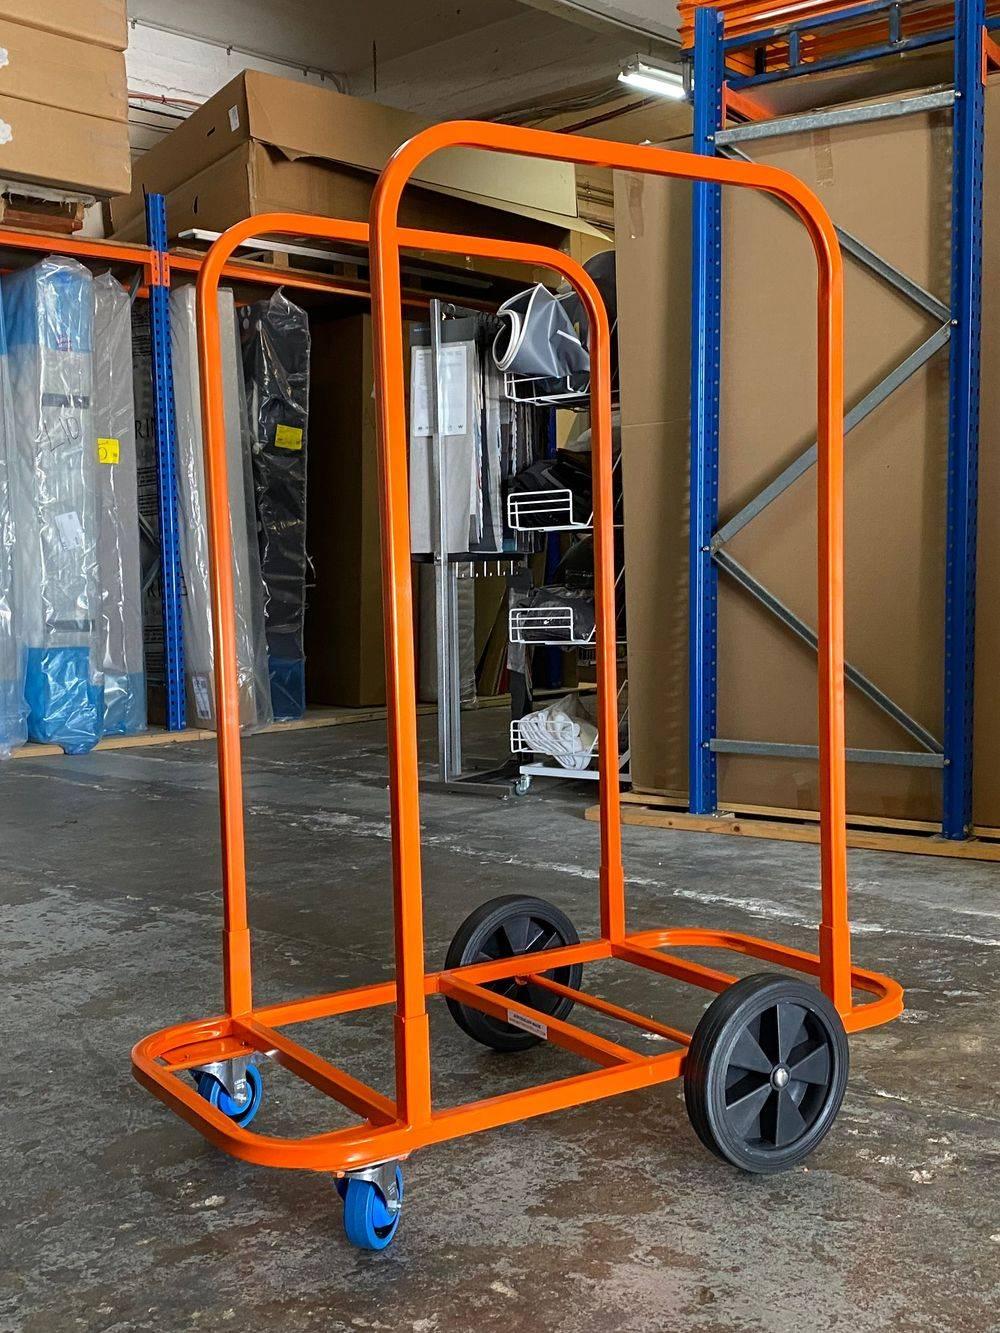 Delivery-Pro Trolley - mattresstrolley.com